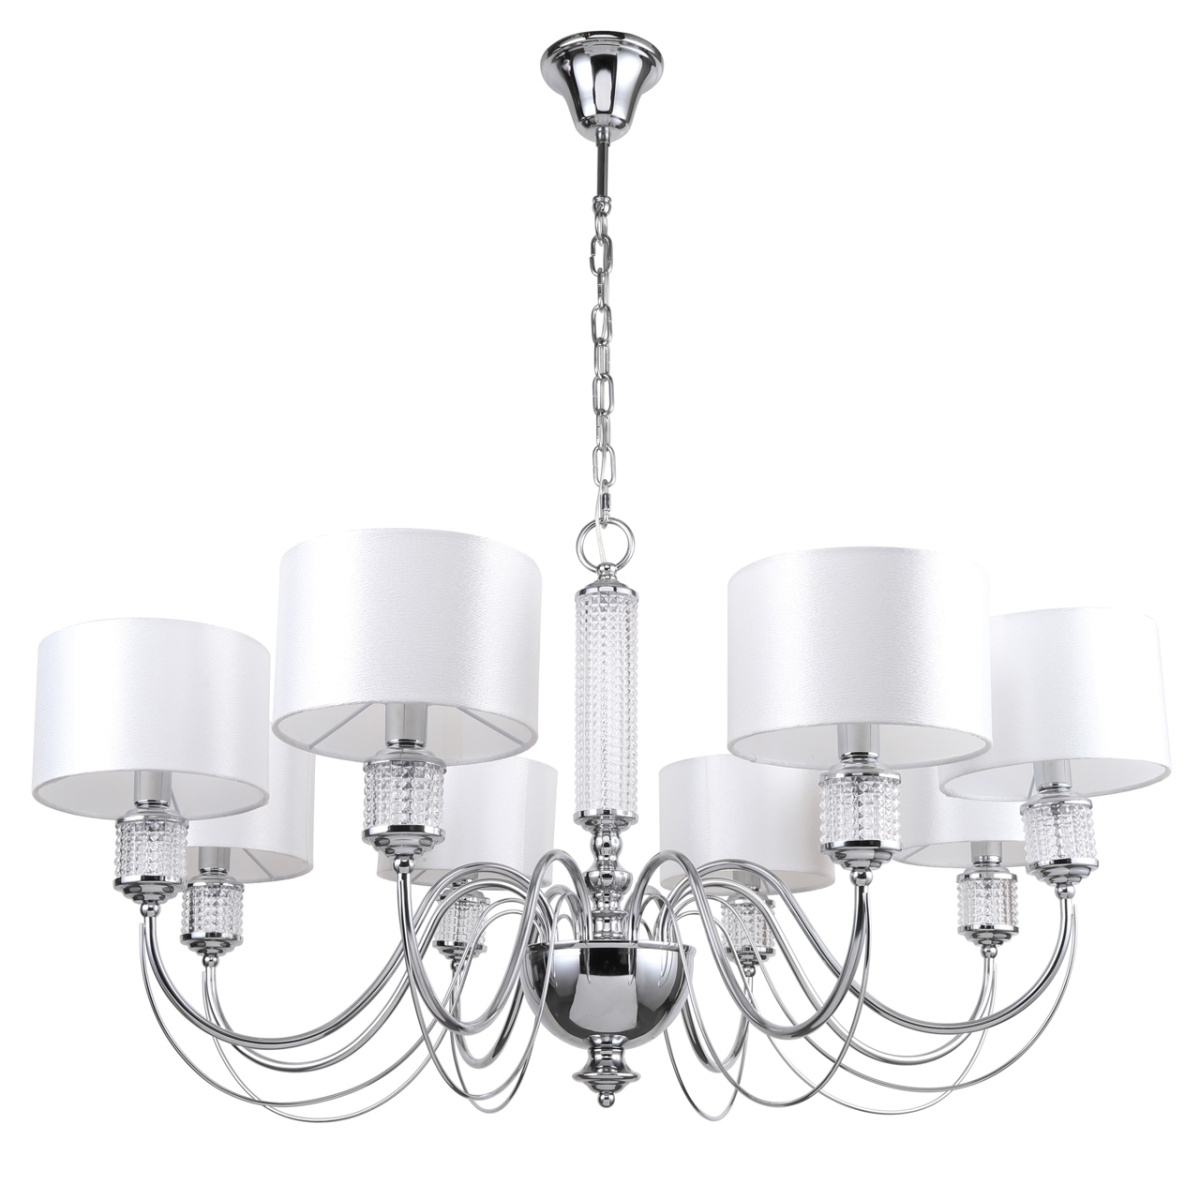 Lustra Light Elegance Ontario